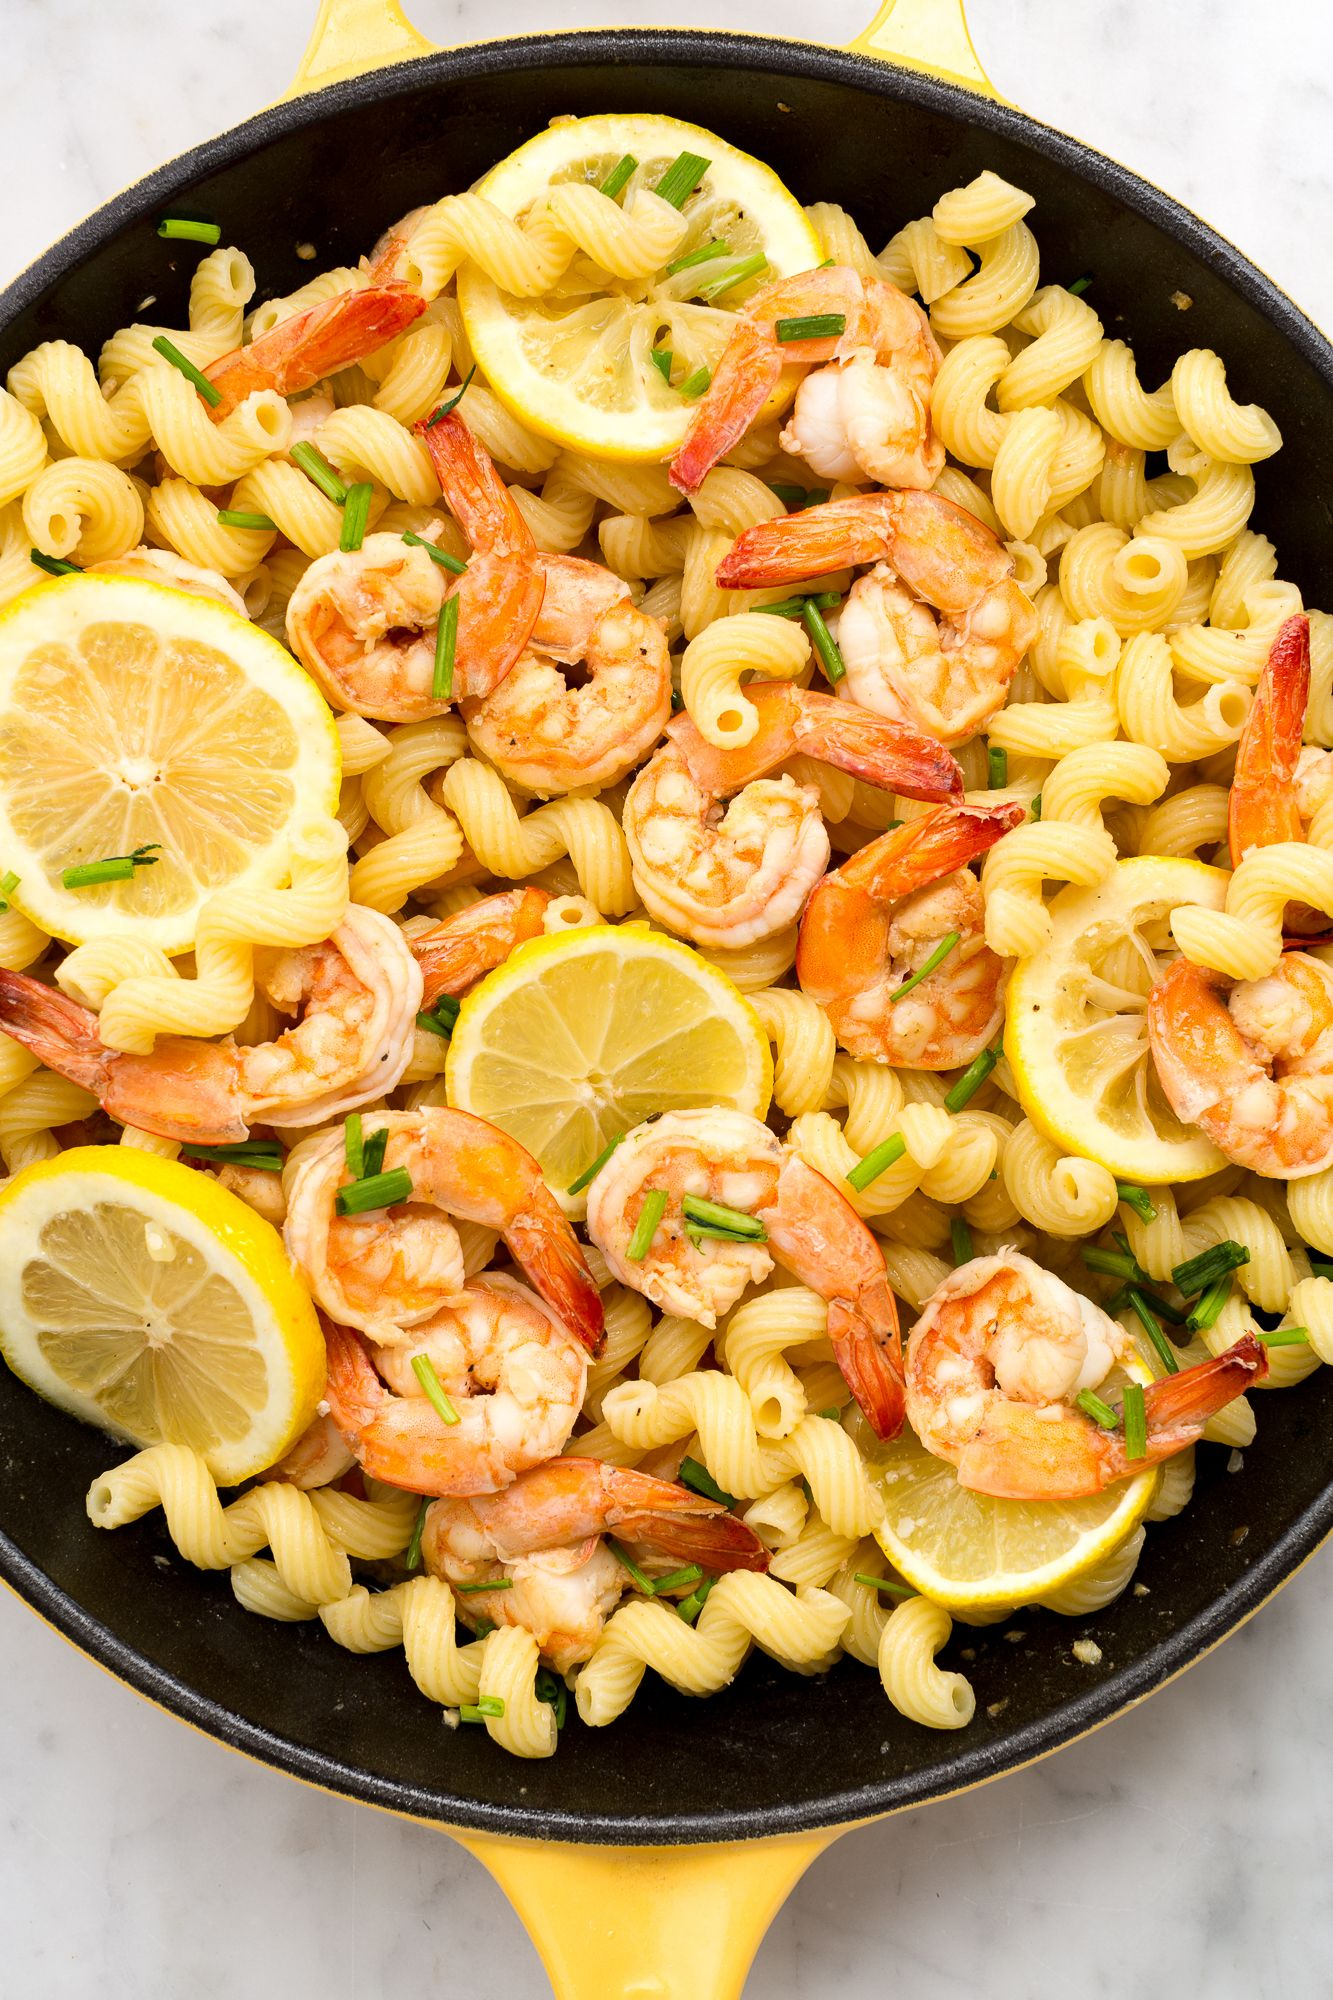 20 Easy Shrimp Pasta Recipes Best Pasta Dishes With Shrimp Delish Com